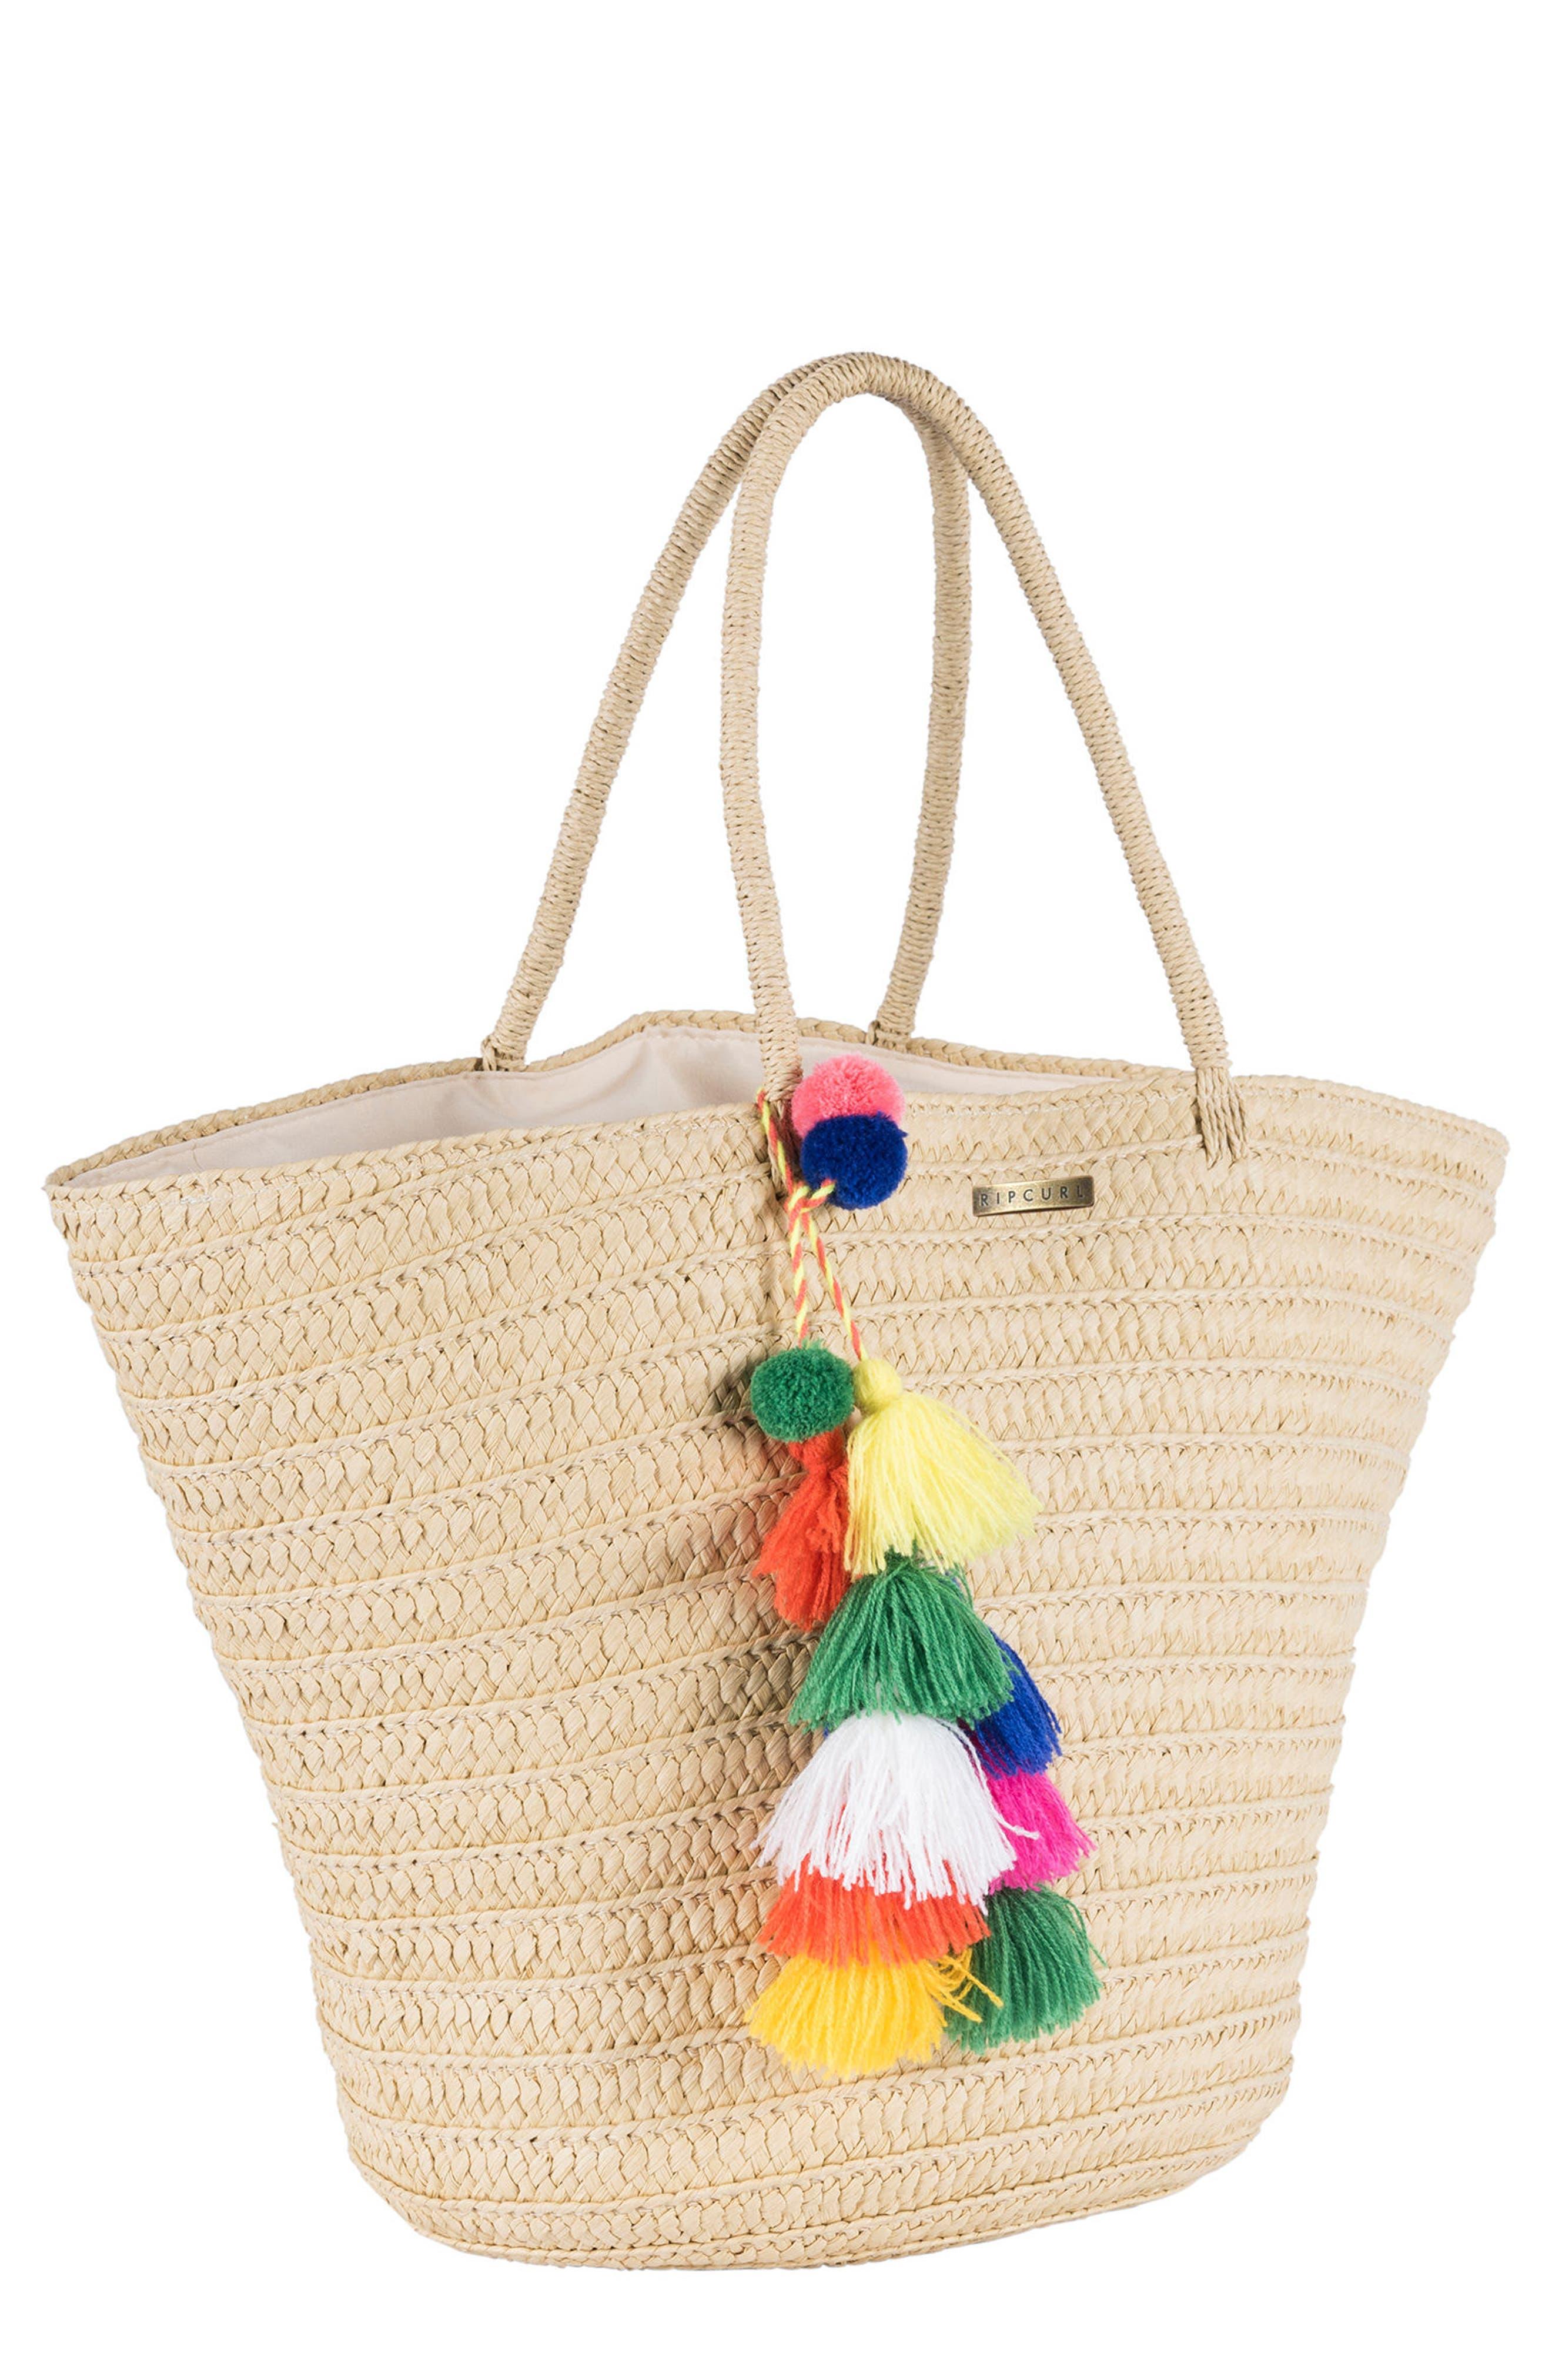 Beach Bazaar Straw Bag,                             Main thumbnail 1, color,                             Natural